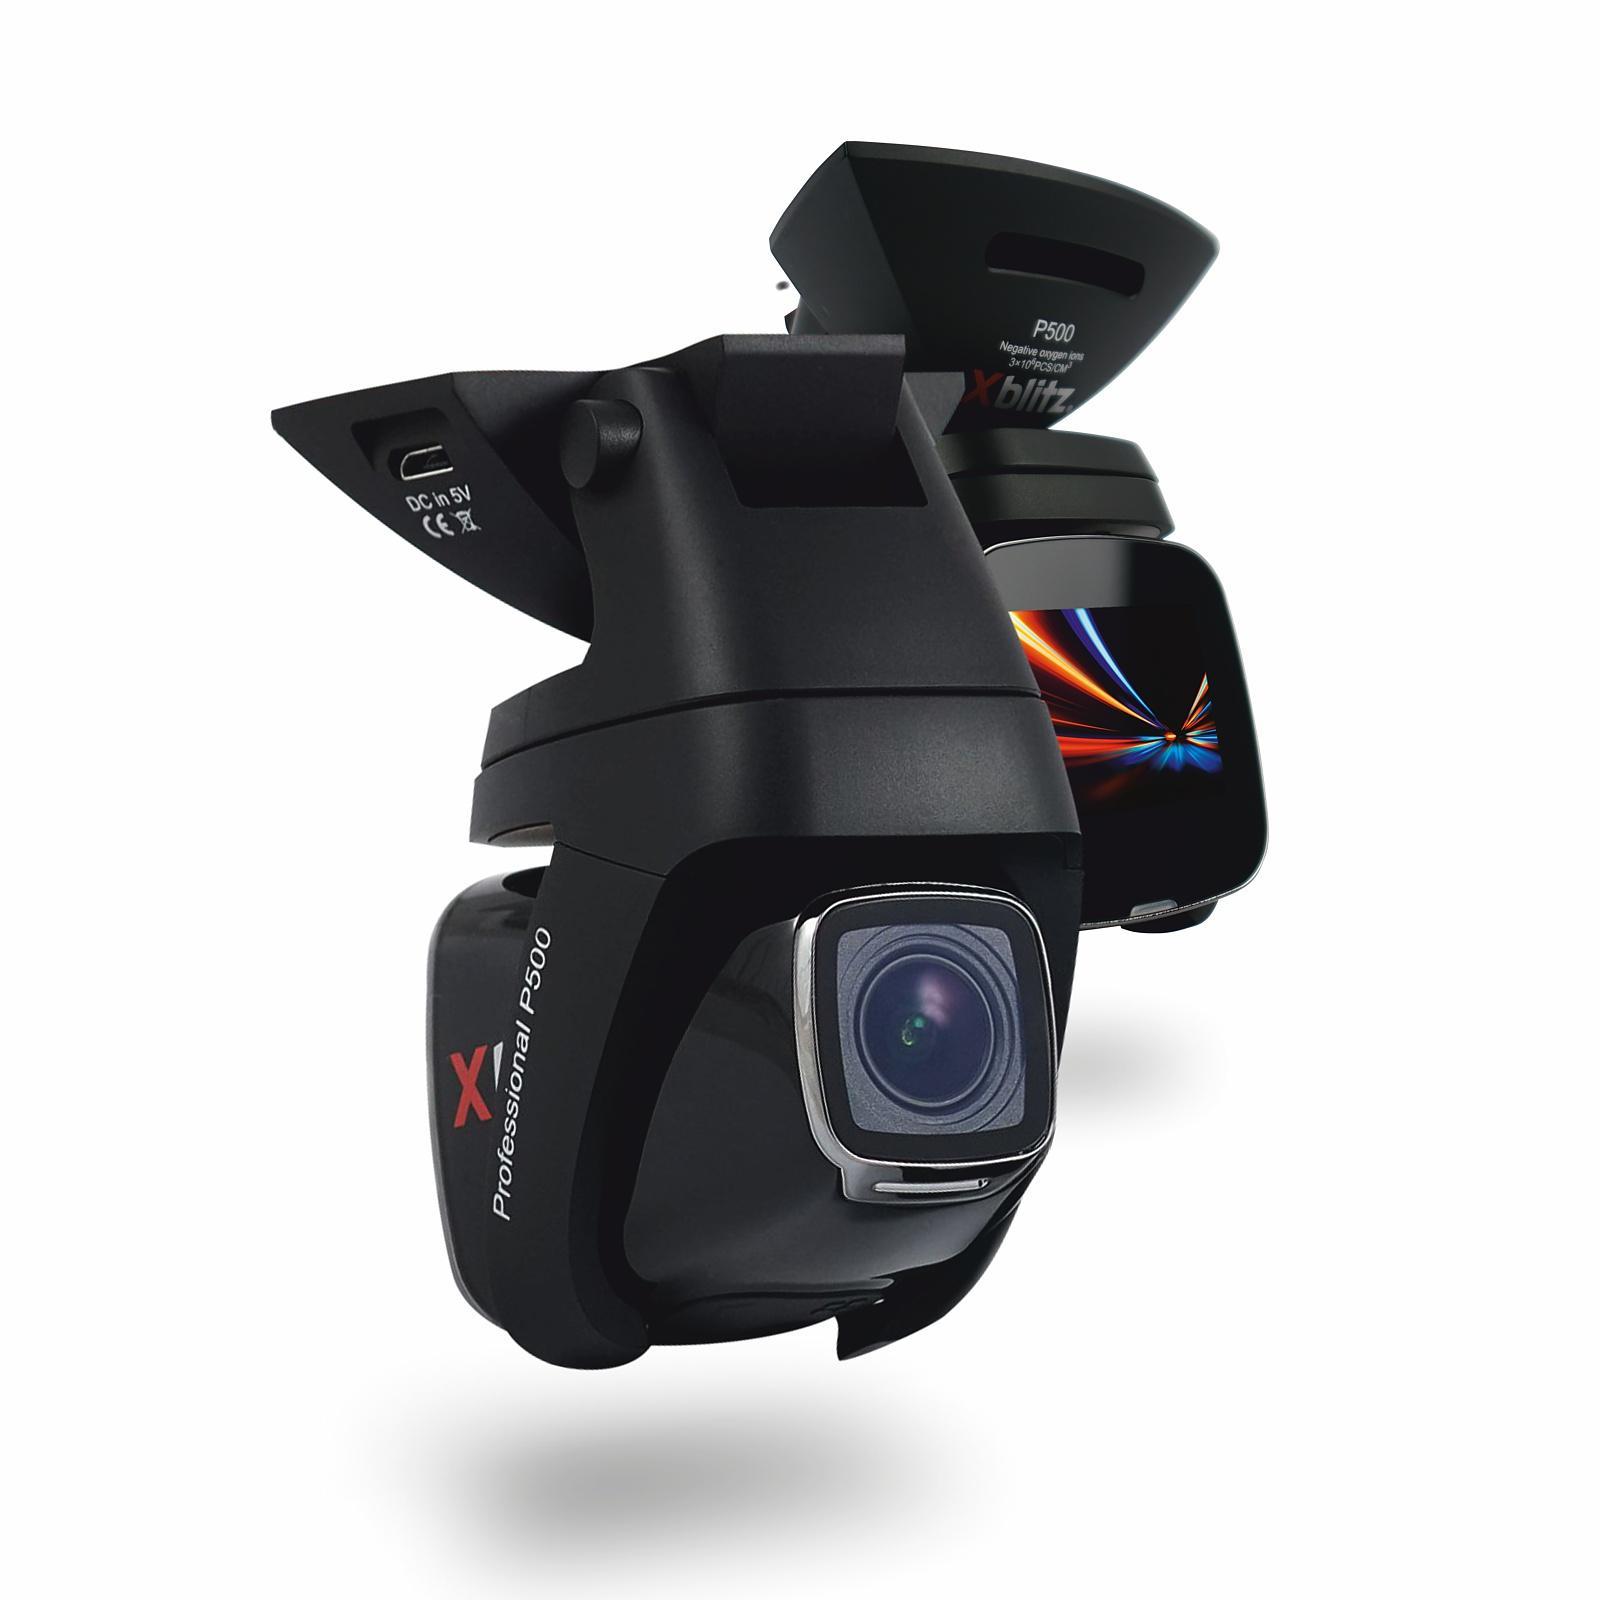 Dashcam P500 XBLITZ P500 originales de qualité